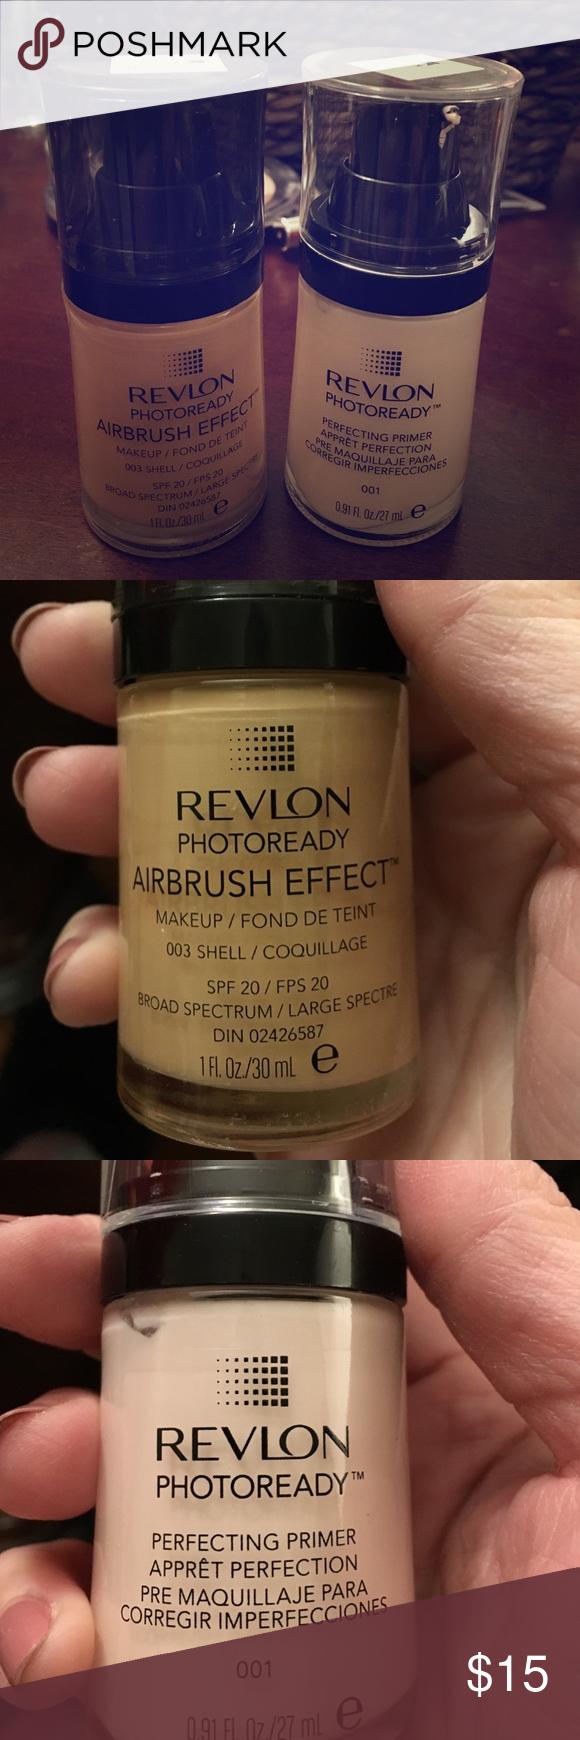 Revlon Photoready Airbrush Effect Set Revlon photoready